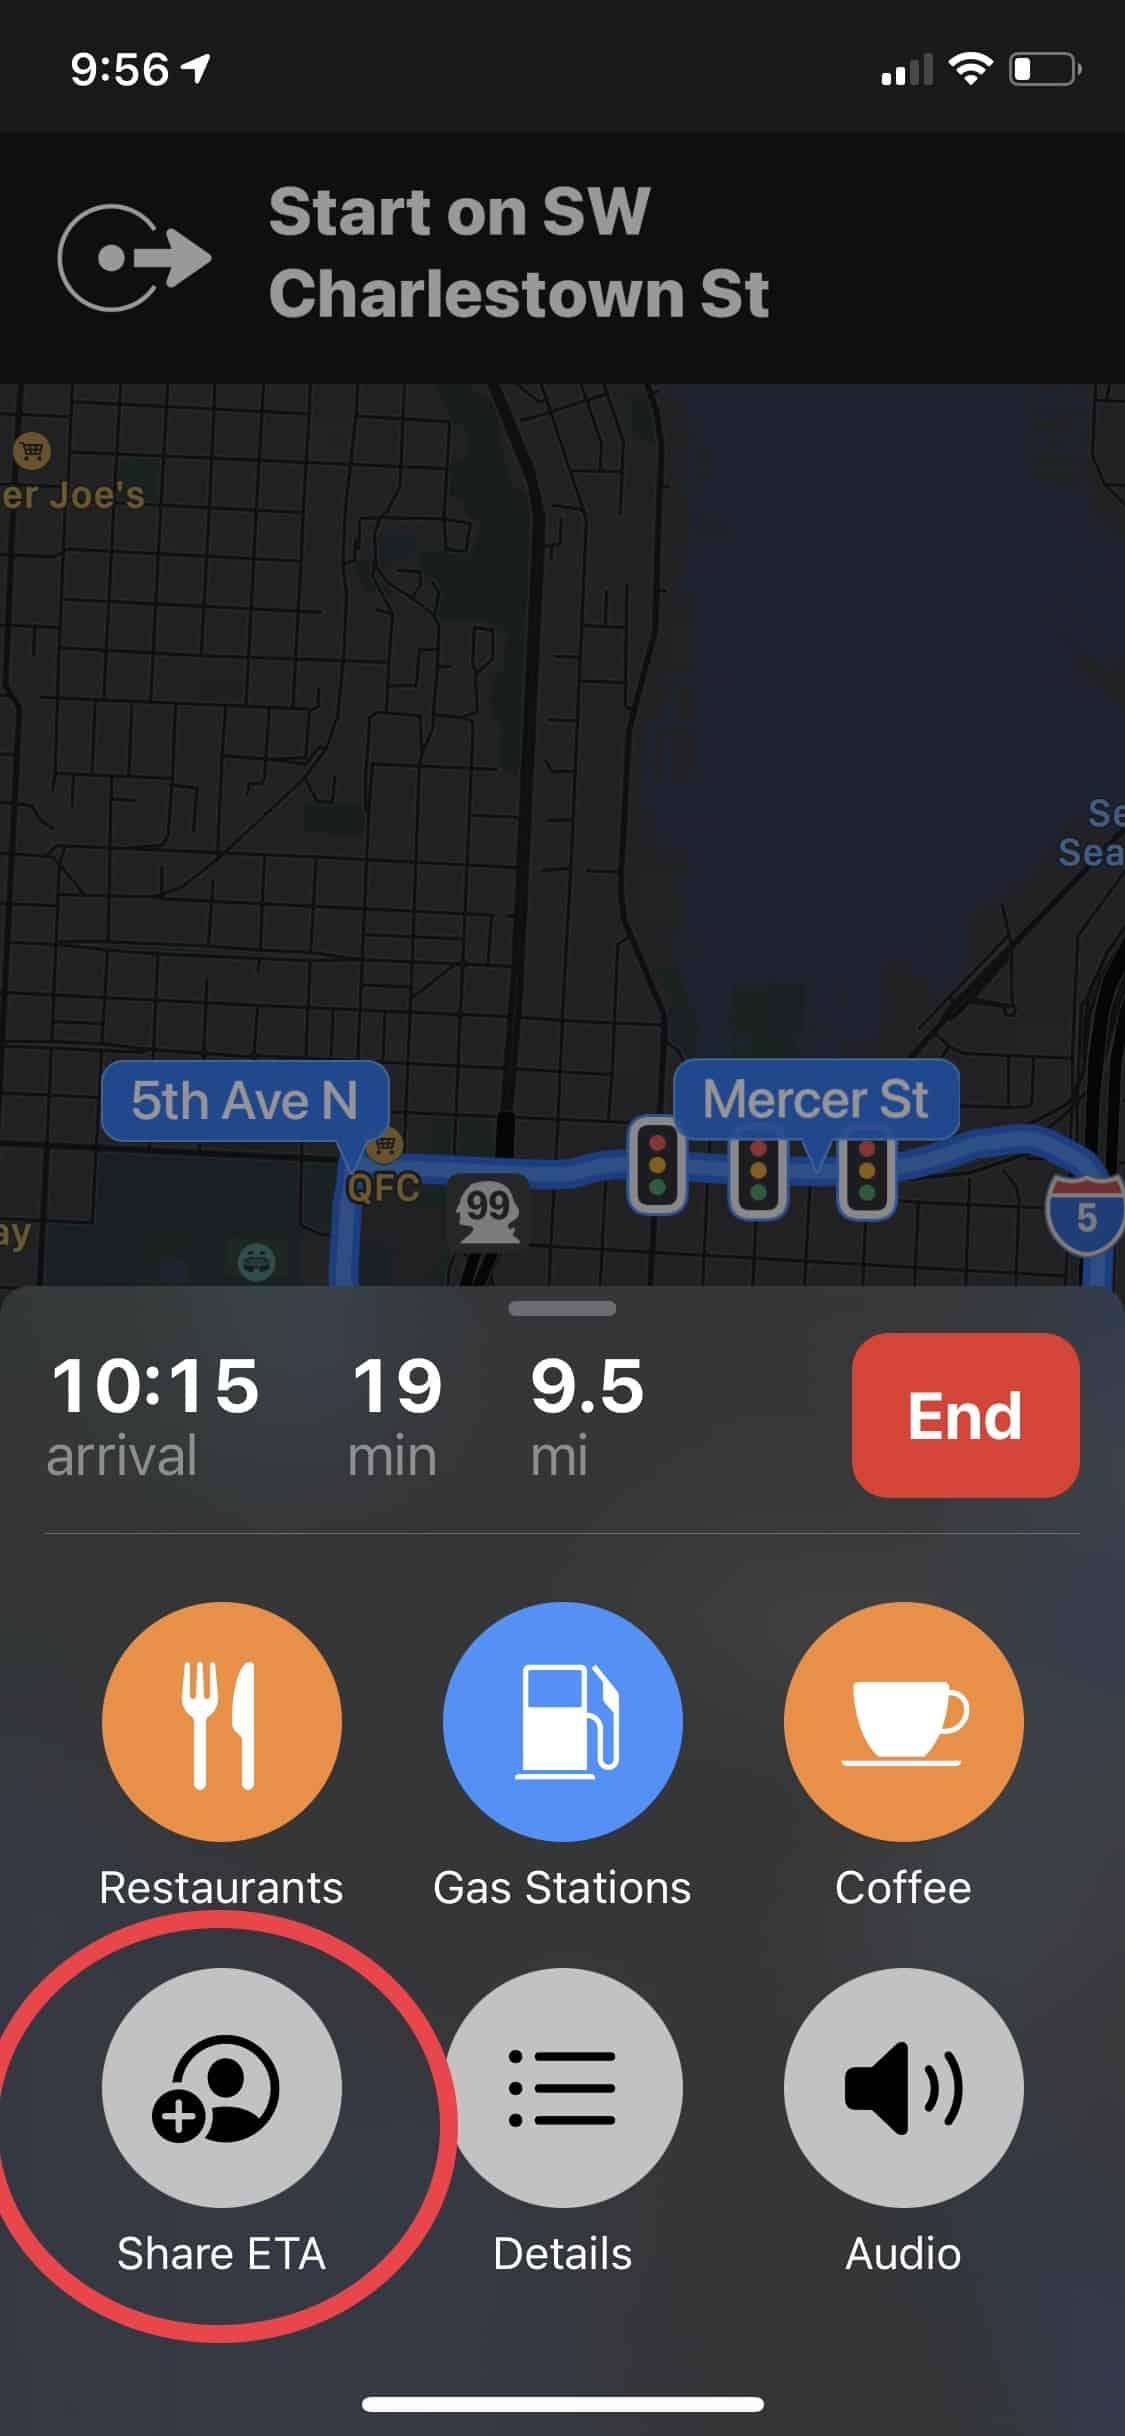 Share your ETA - Apple Maps